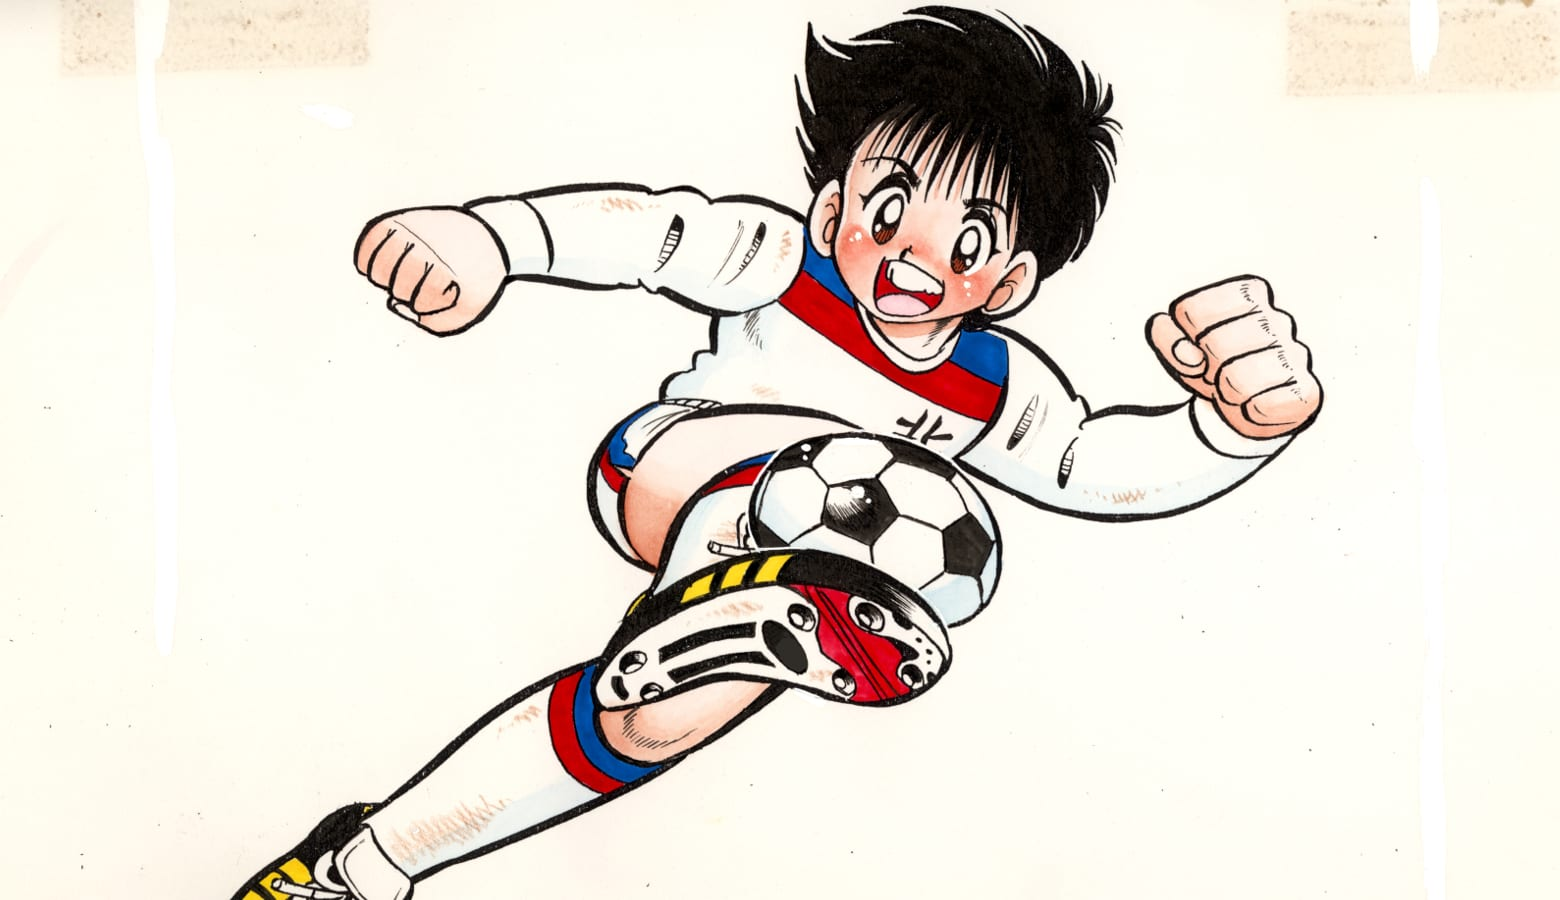 Hassiker der Woche: Kickers